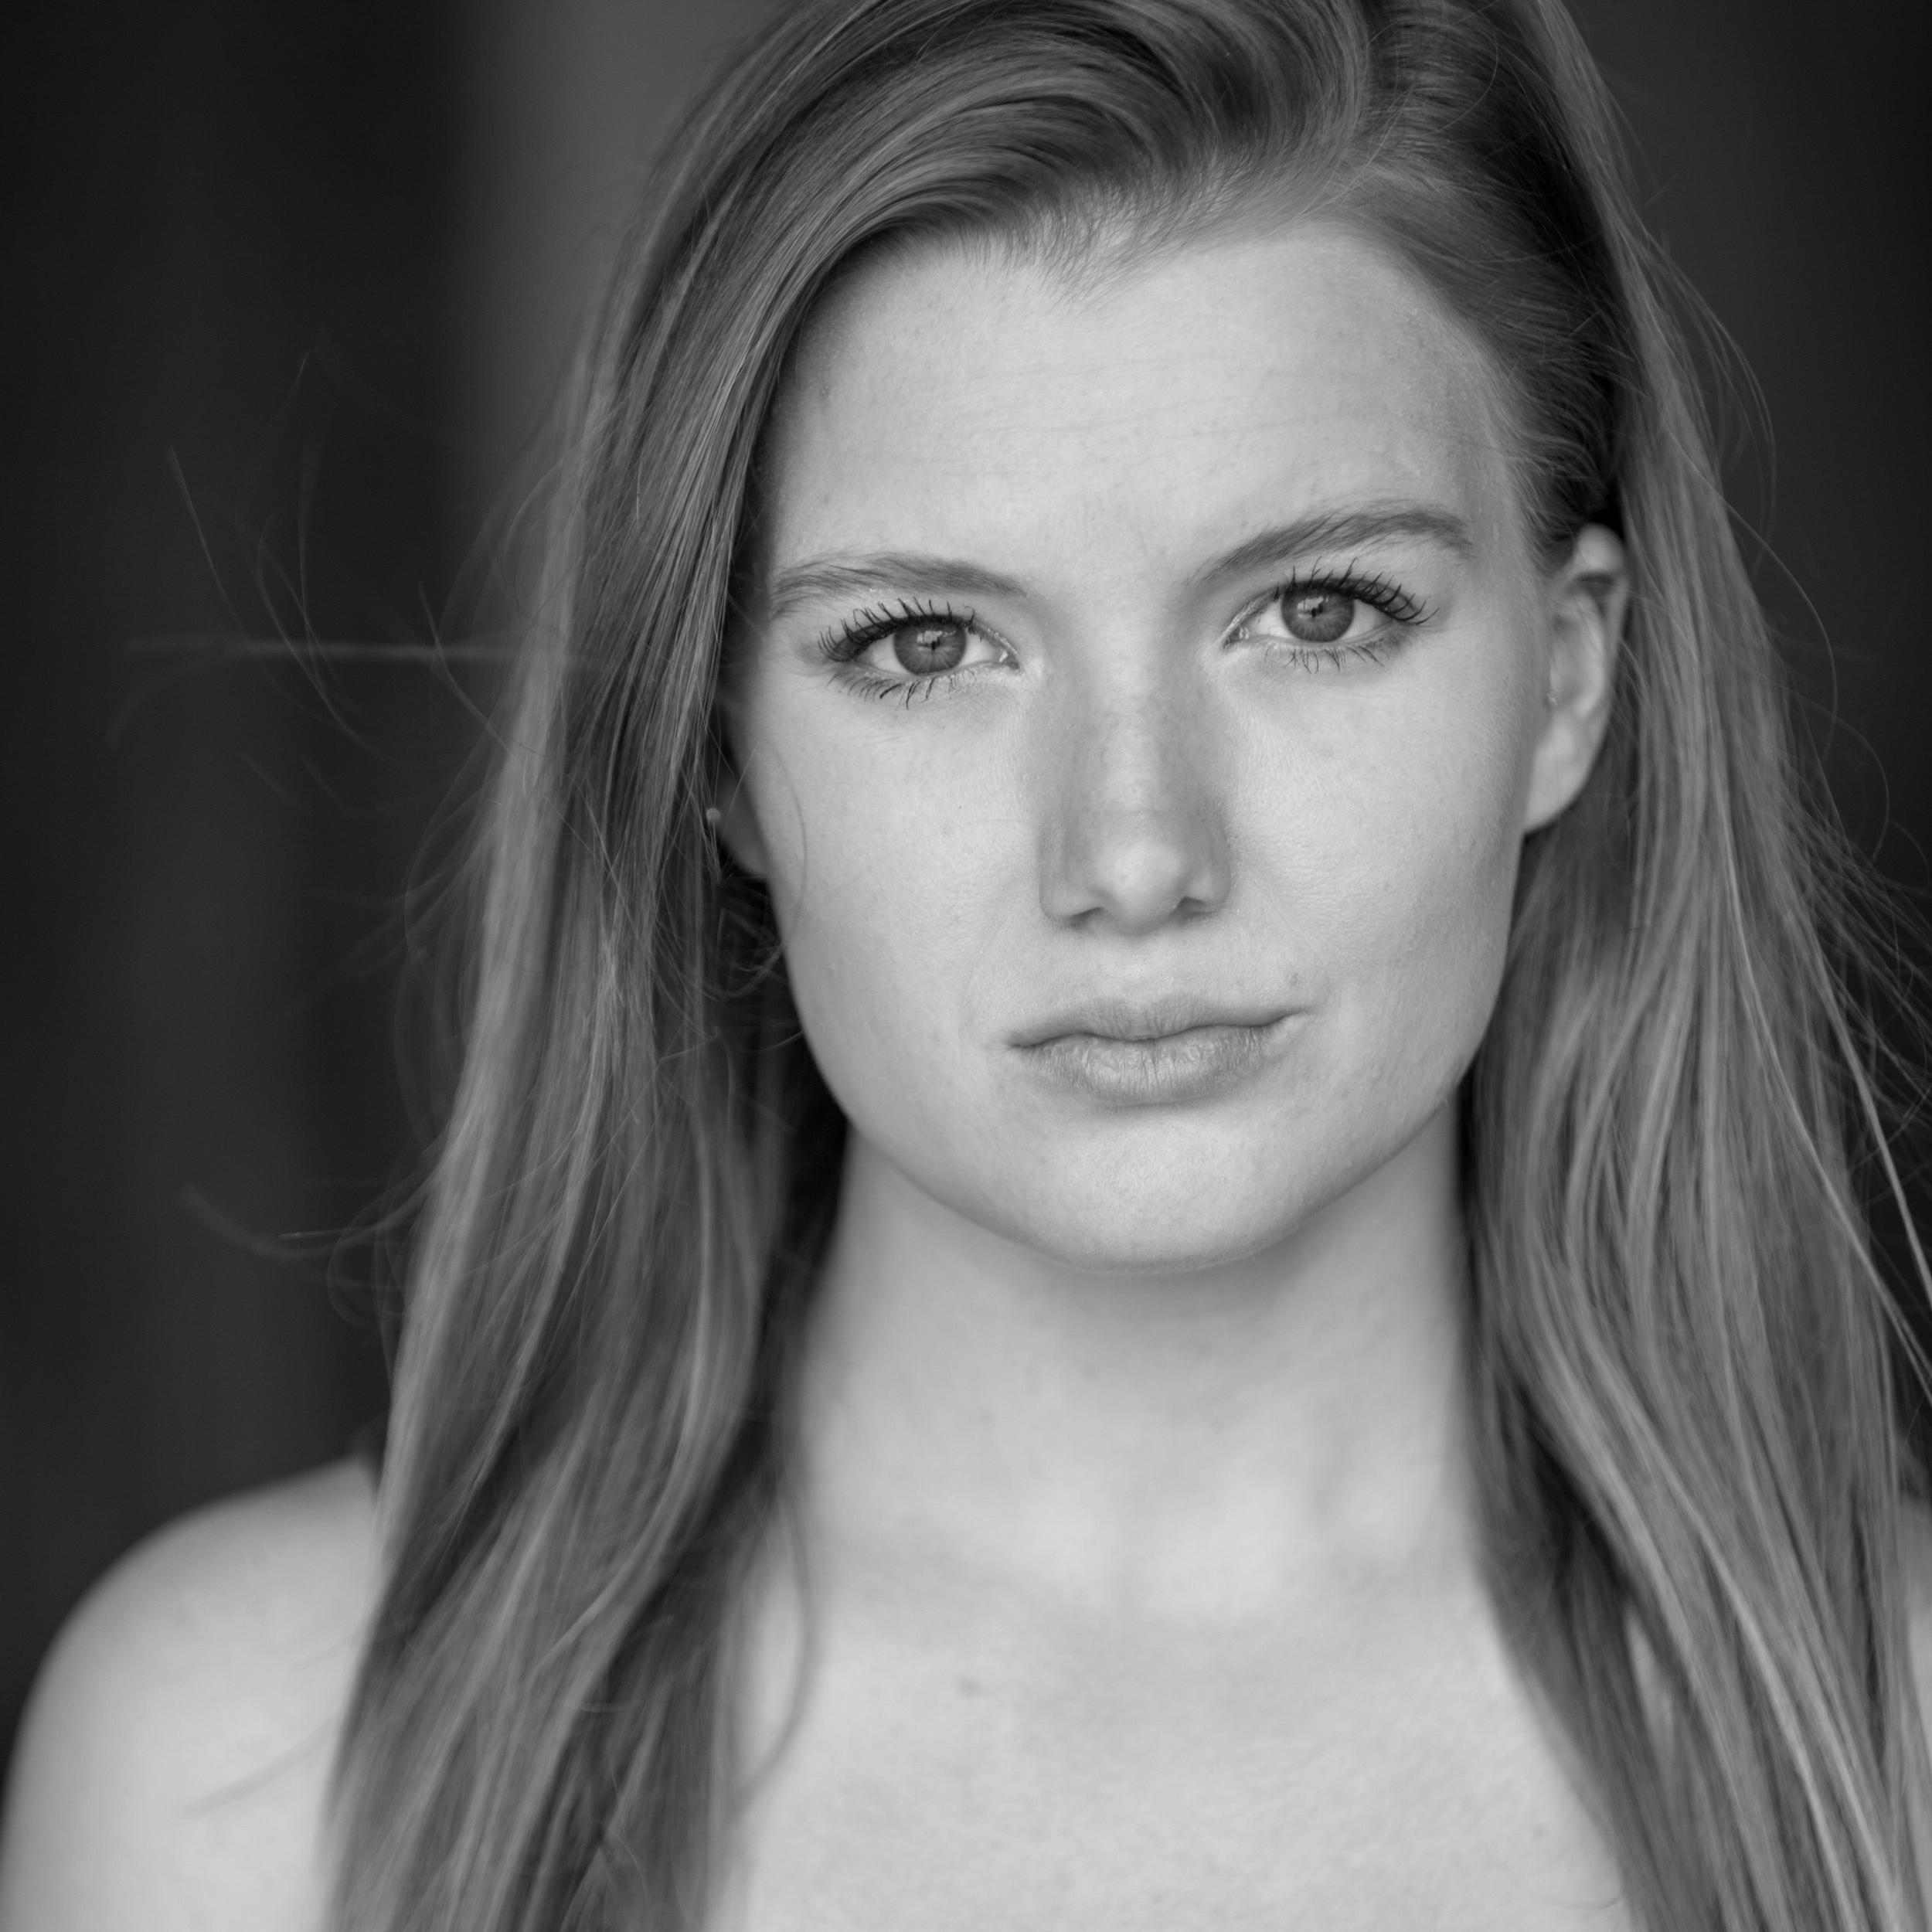 Samantha Binkerd / Actor (Ester)